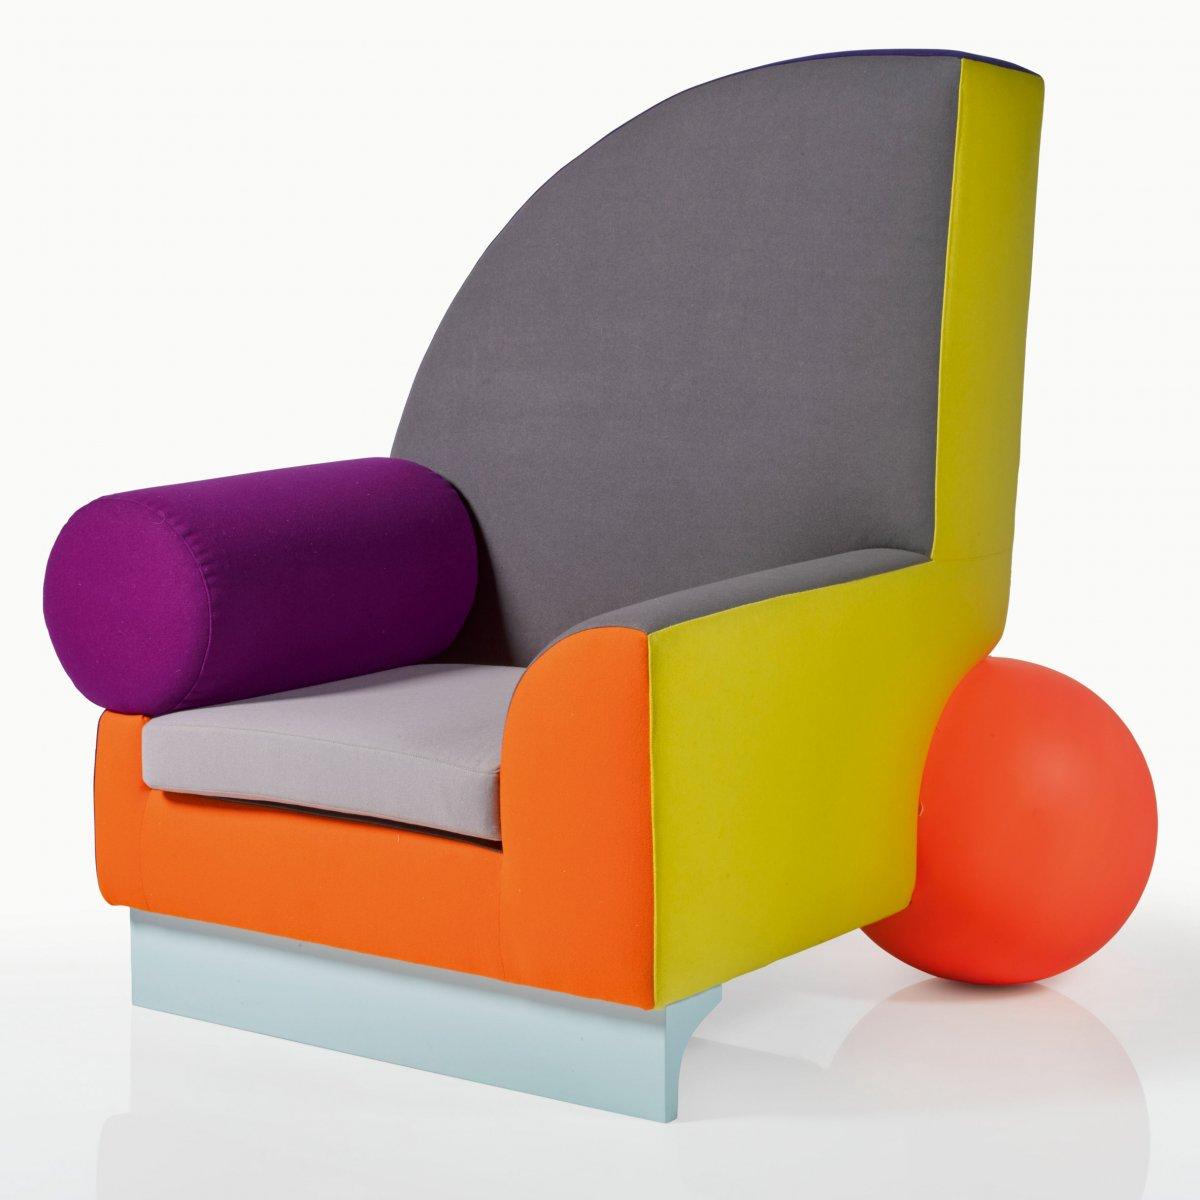 five-most-iconic-pieces-david-bowie-memphis-postmodern-auction-sothebys-london_dezeen_2364_col_3.jpg